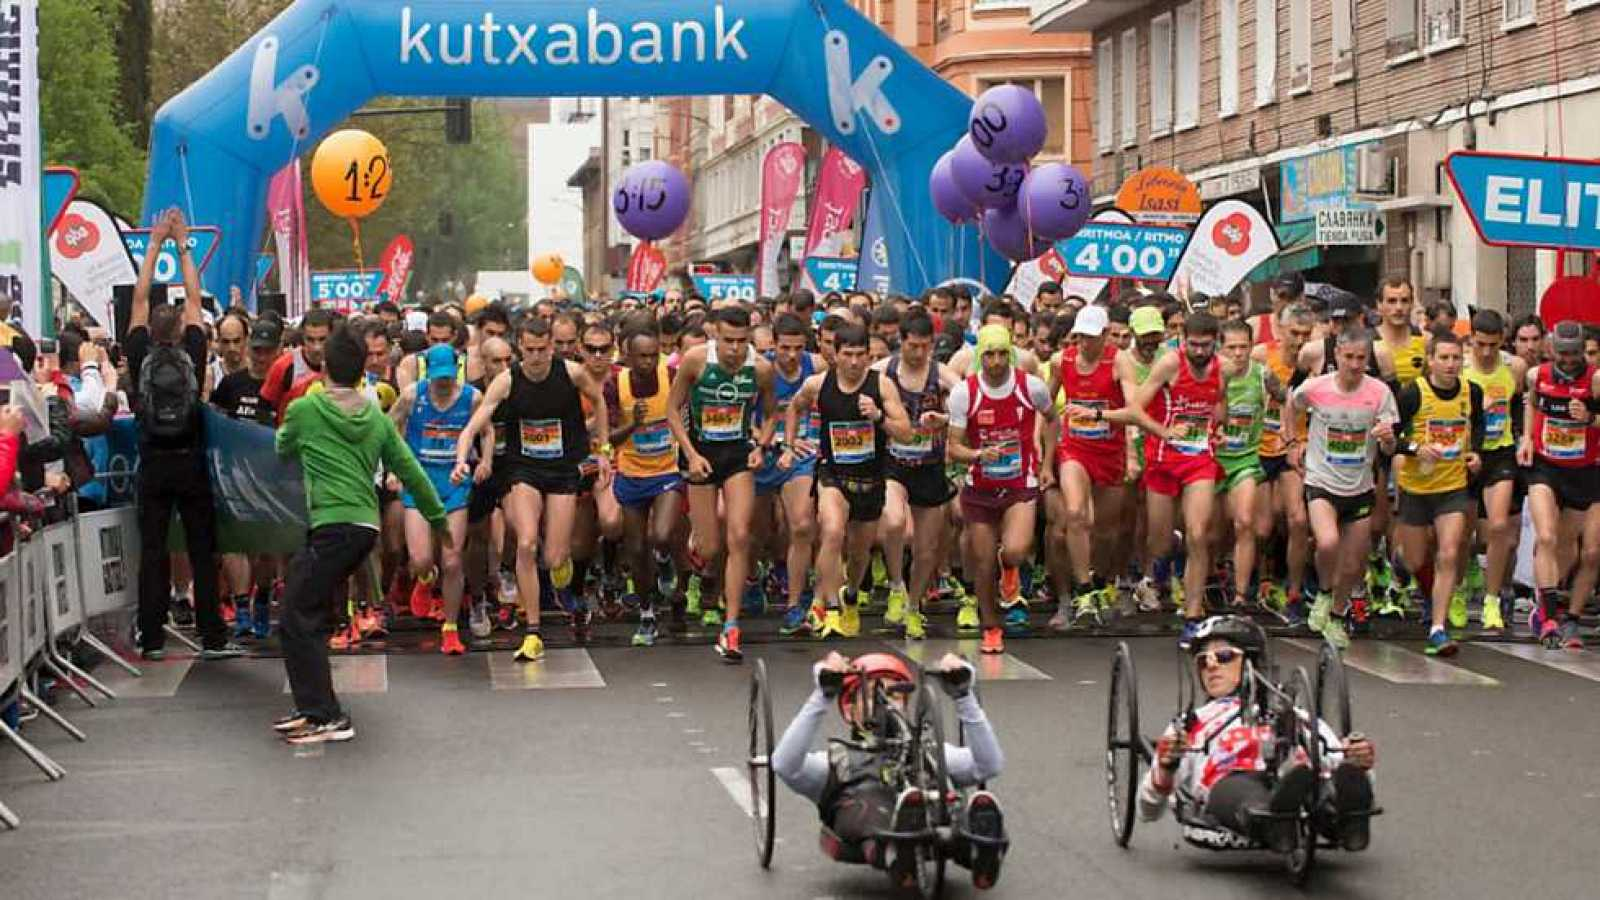 Atletismo - EDP Vitoria-Gasteiz Maratón Martín Fiz 2016 - ver ahora